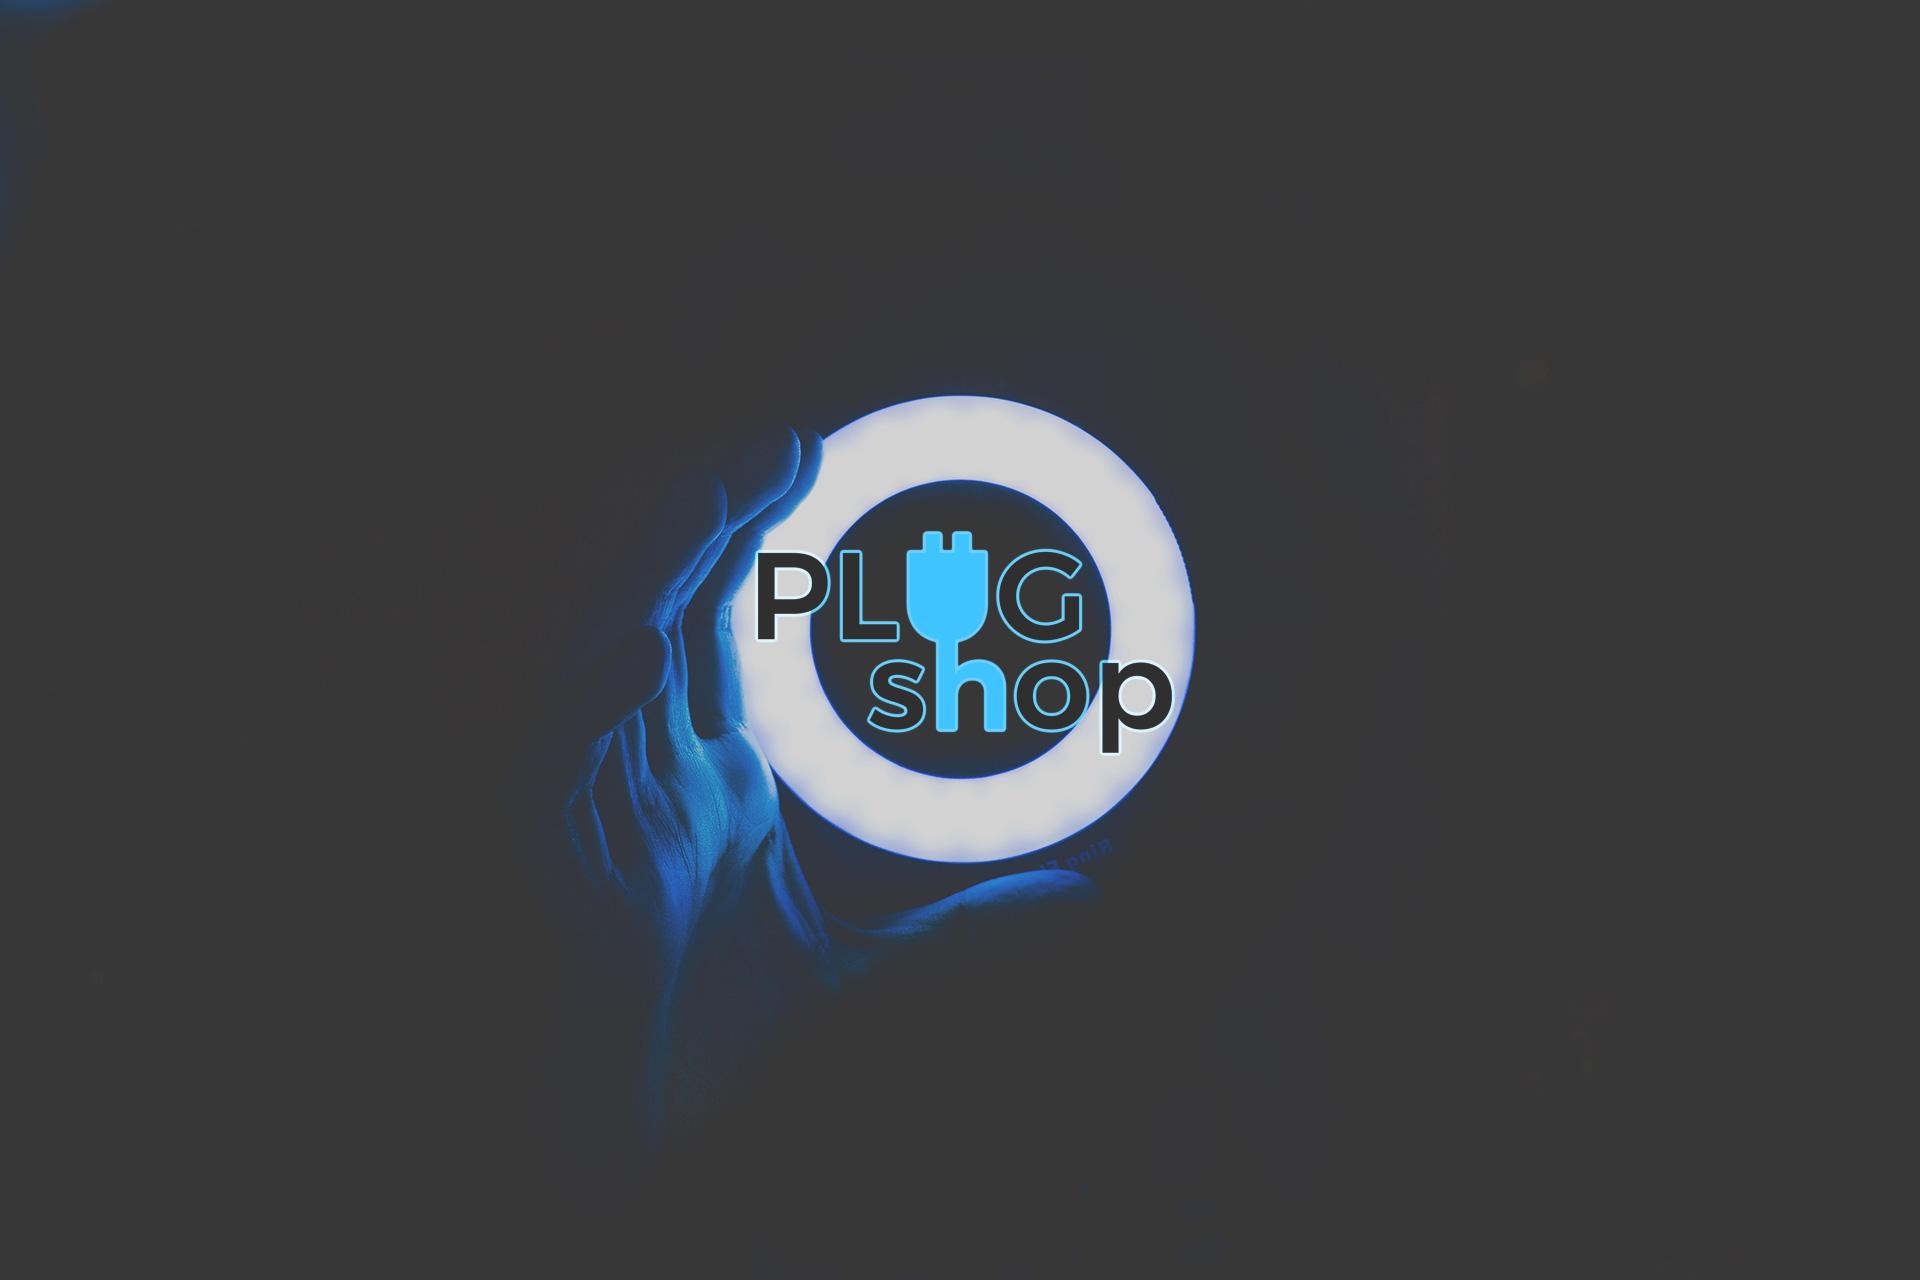 Plug Shop